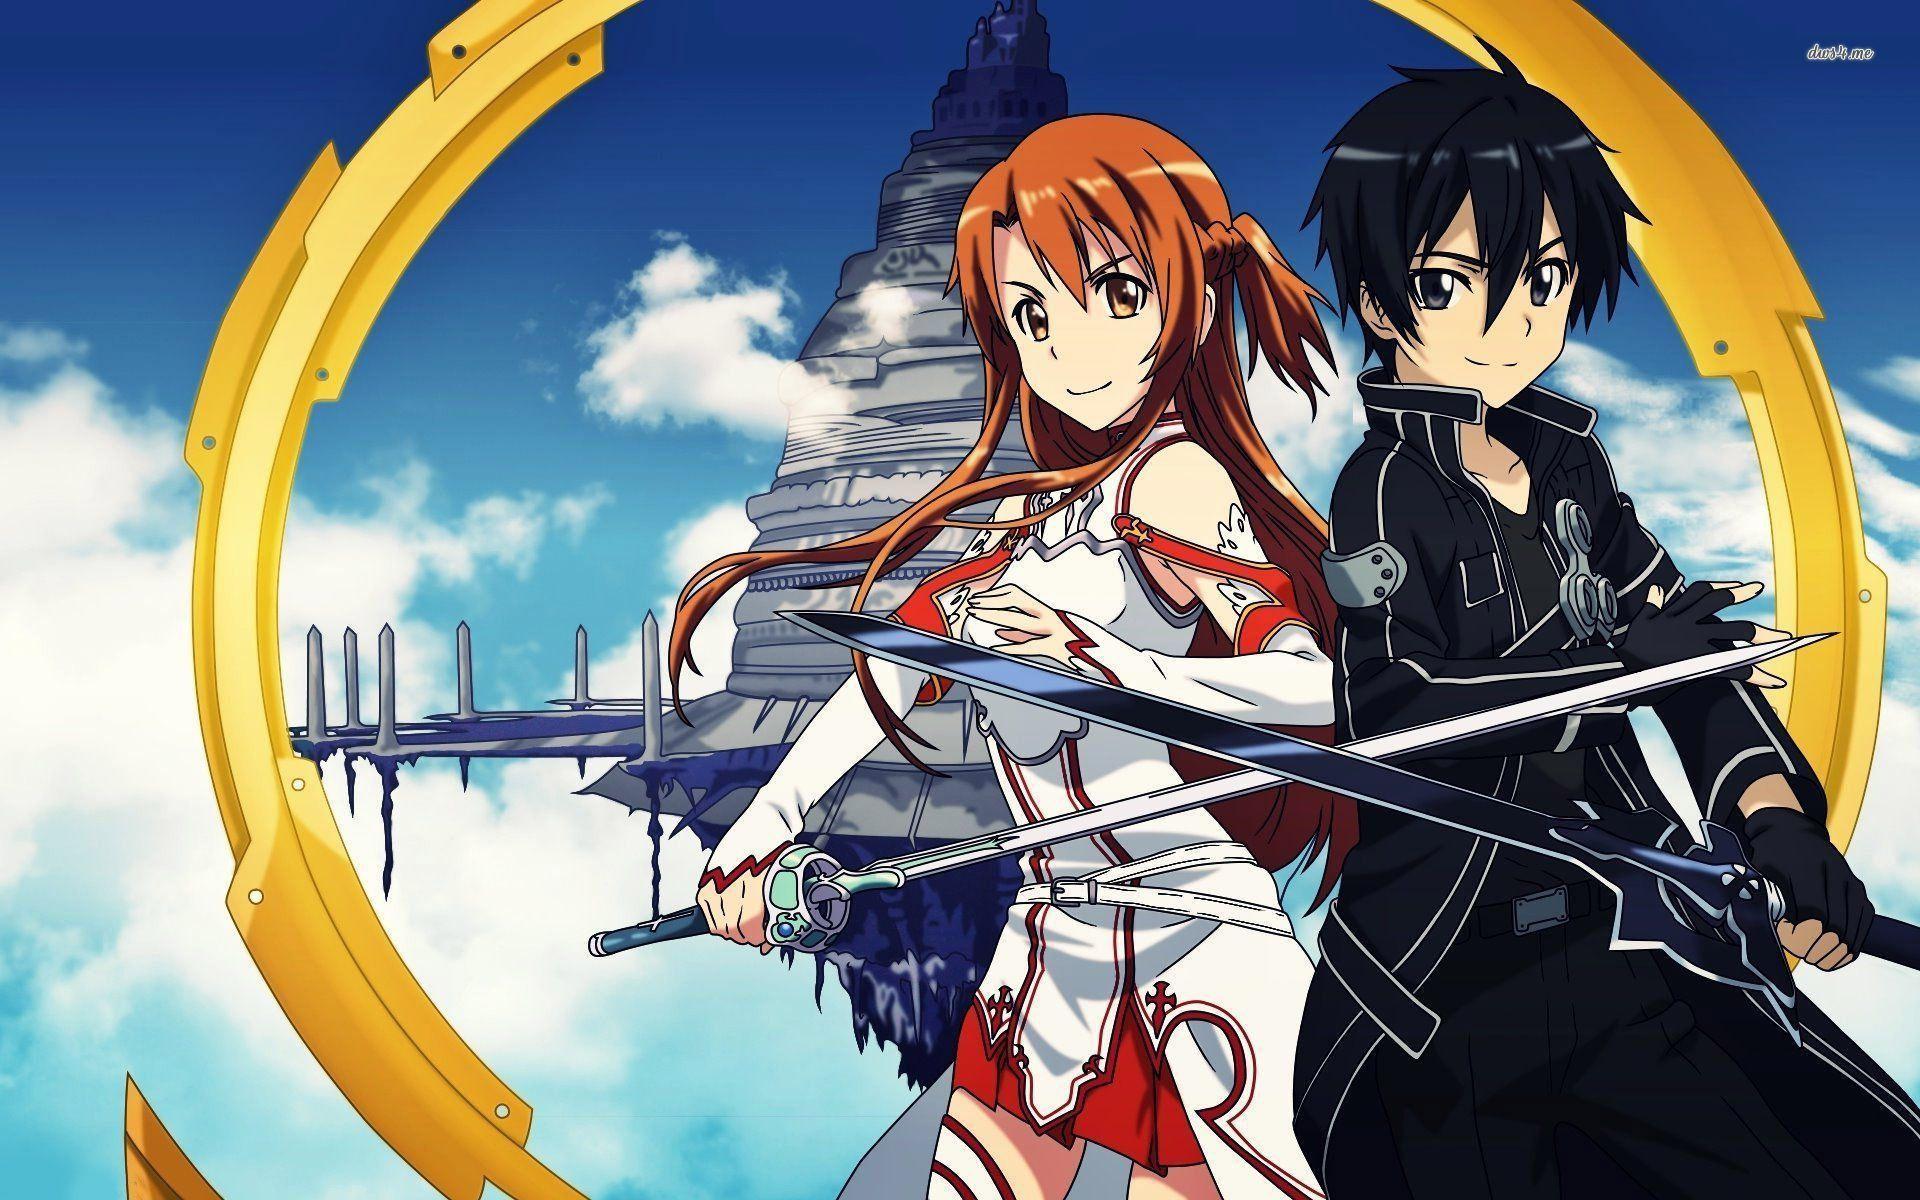 Sword Art Online Wallpaper Asuna – wallpaper.